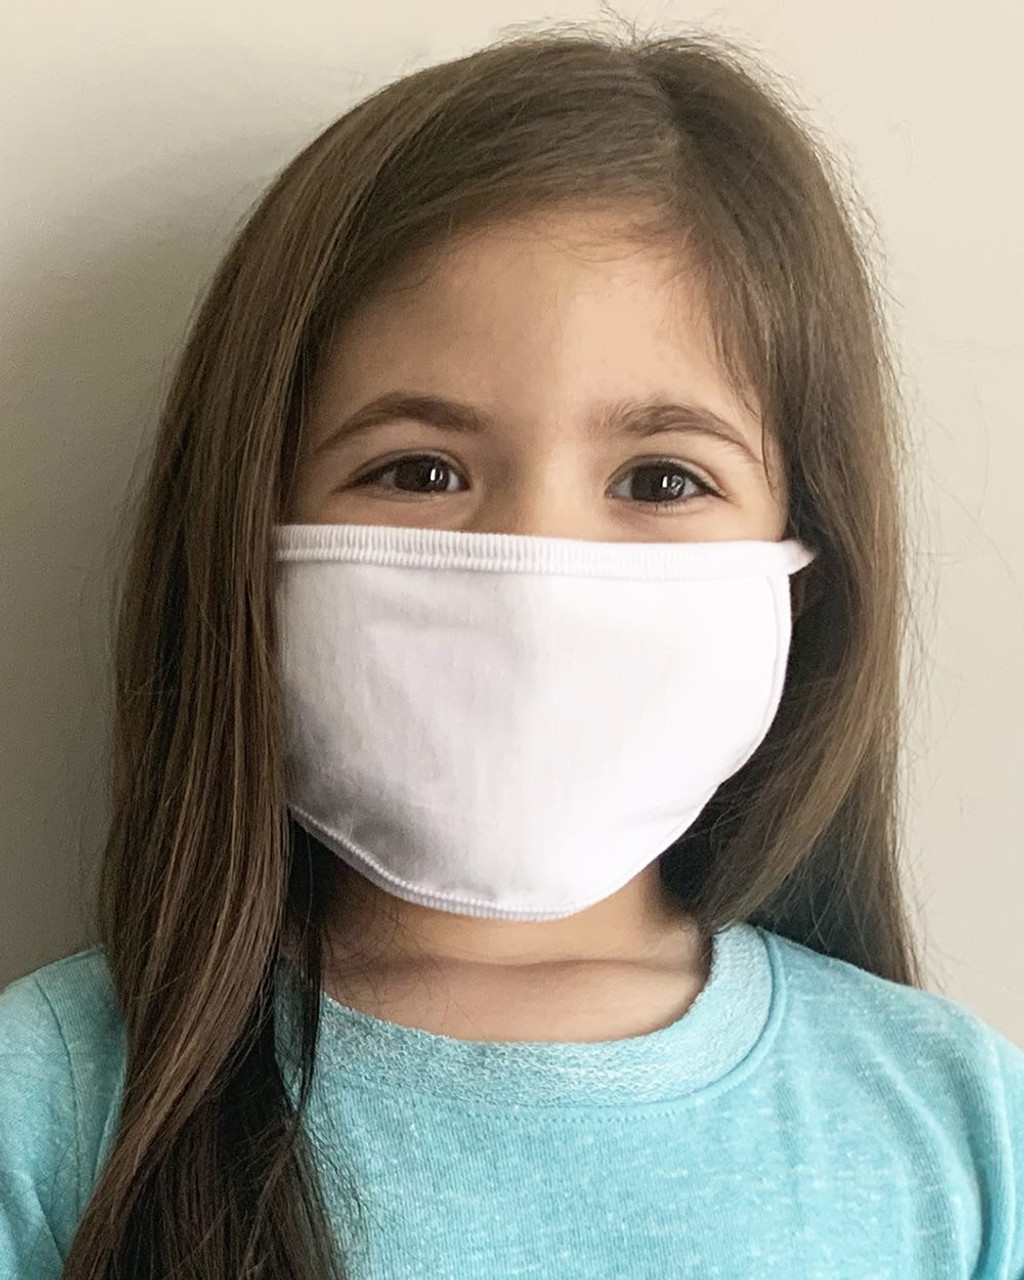 Children's reusable face mask.